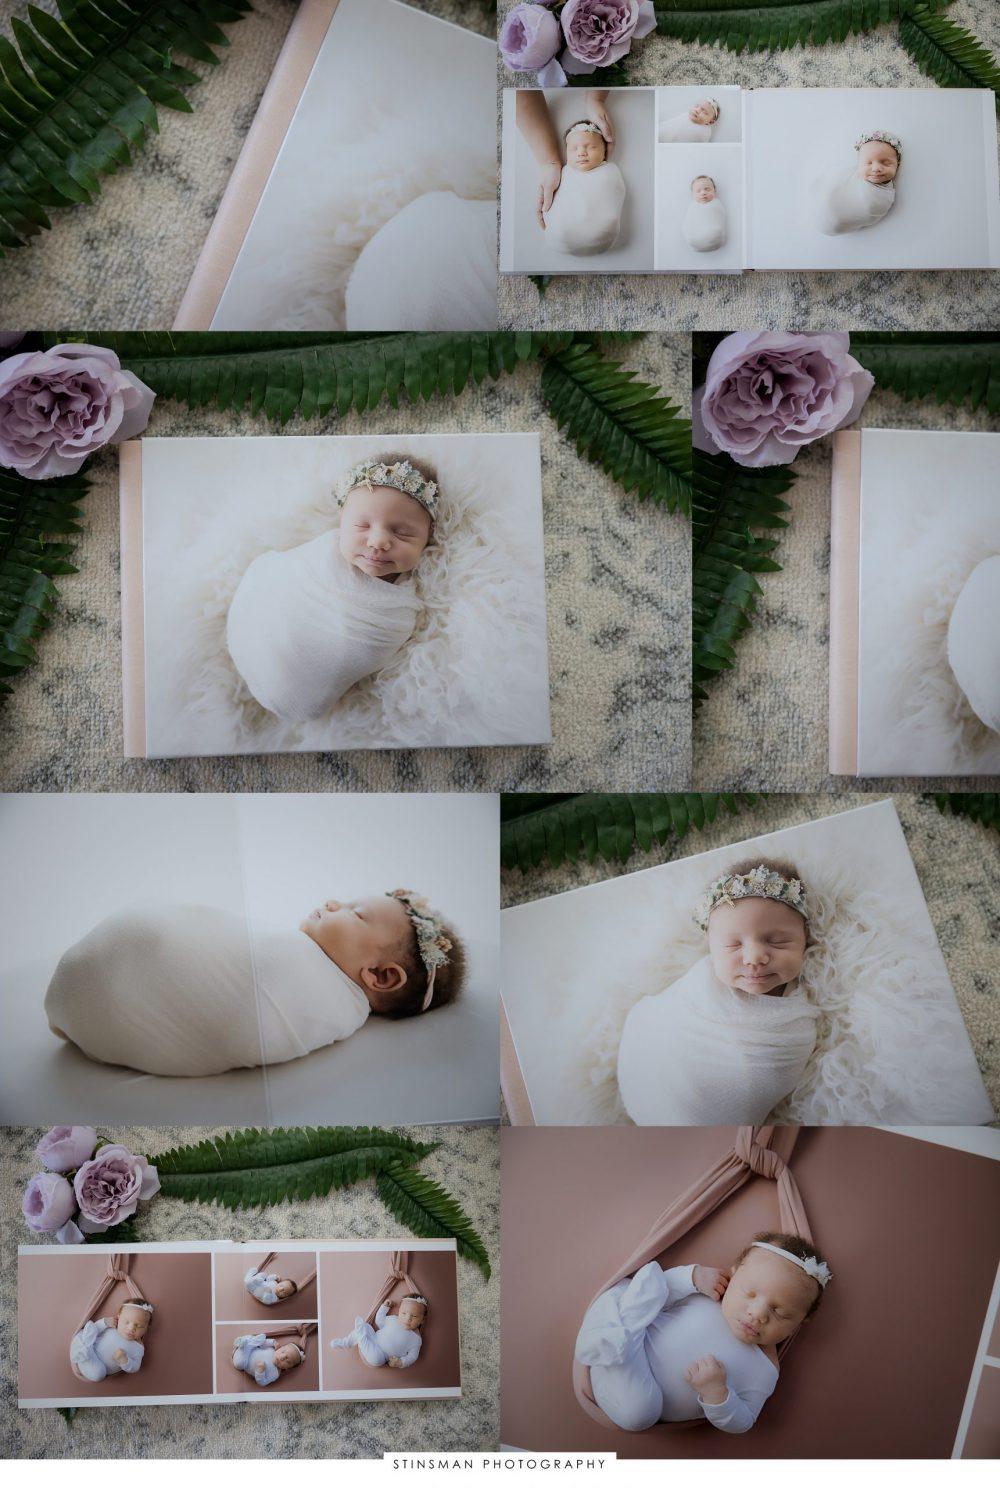 newborn session custom photo album from south jersey newborn photographer